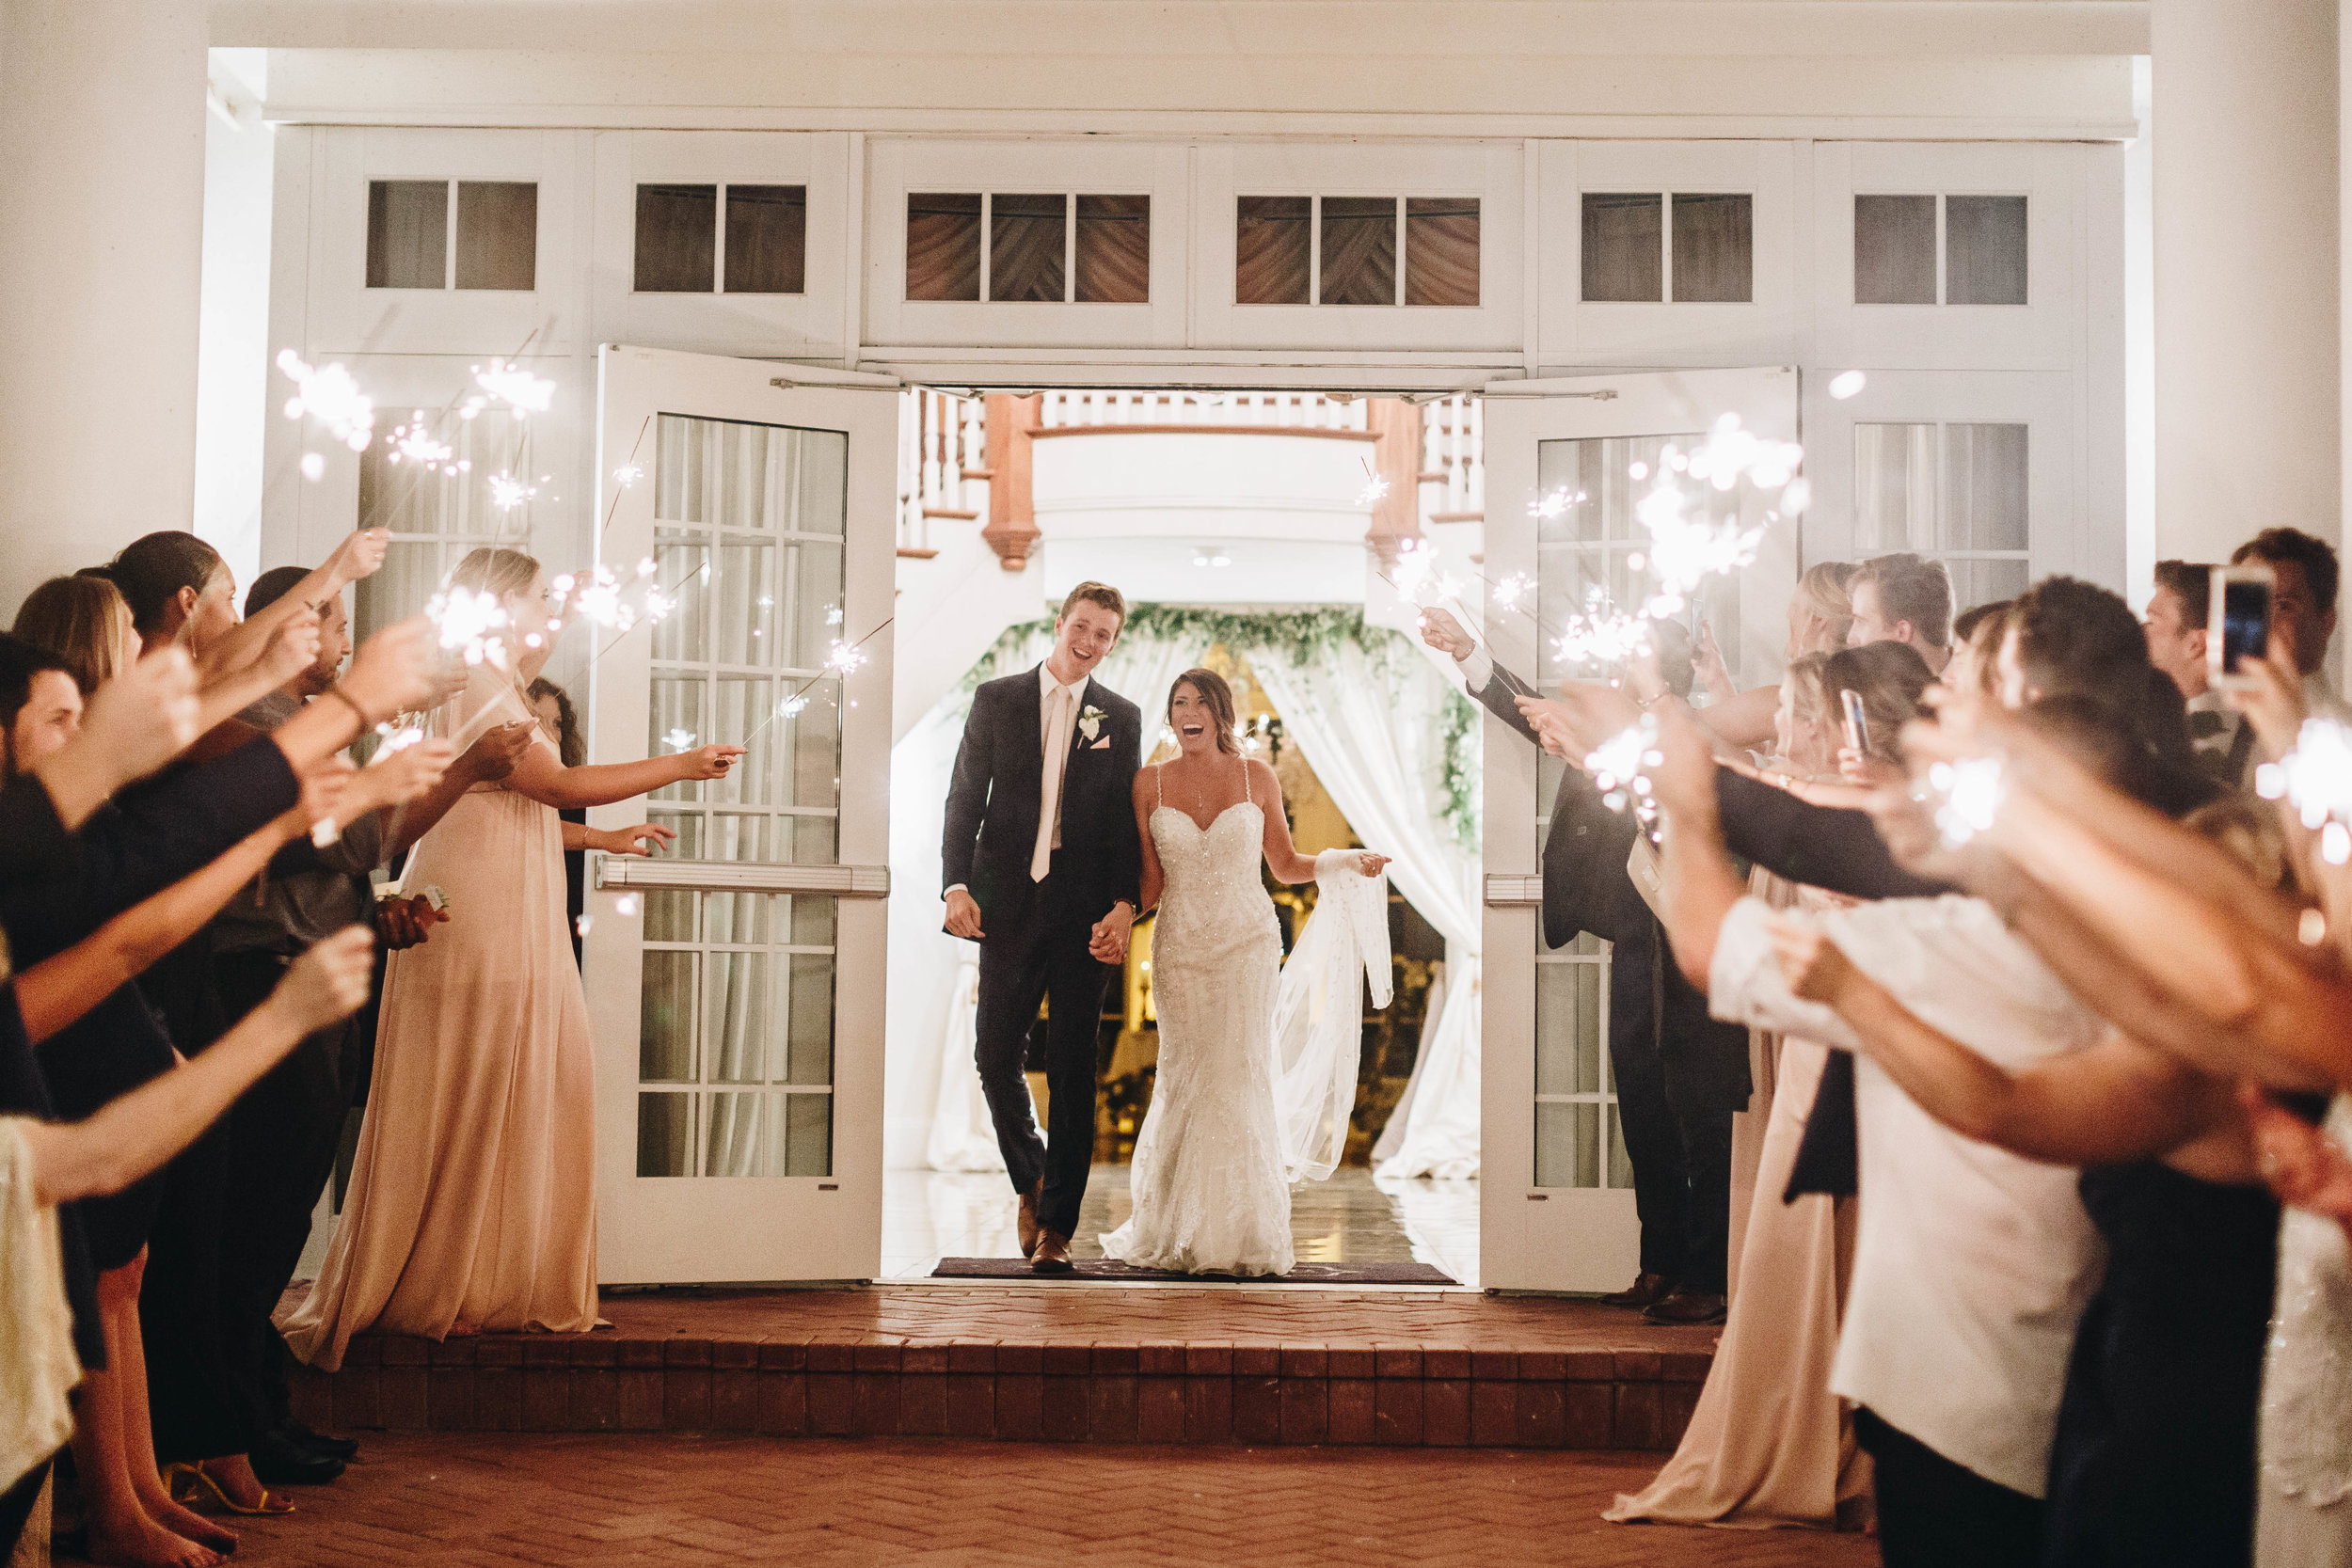 6946f-luxmoregrandestatewedding.jpgluxmoregrandestatewedding.jpg